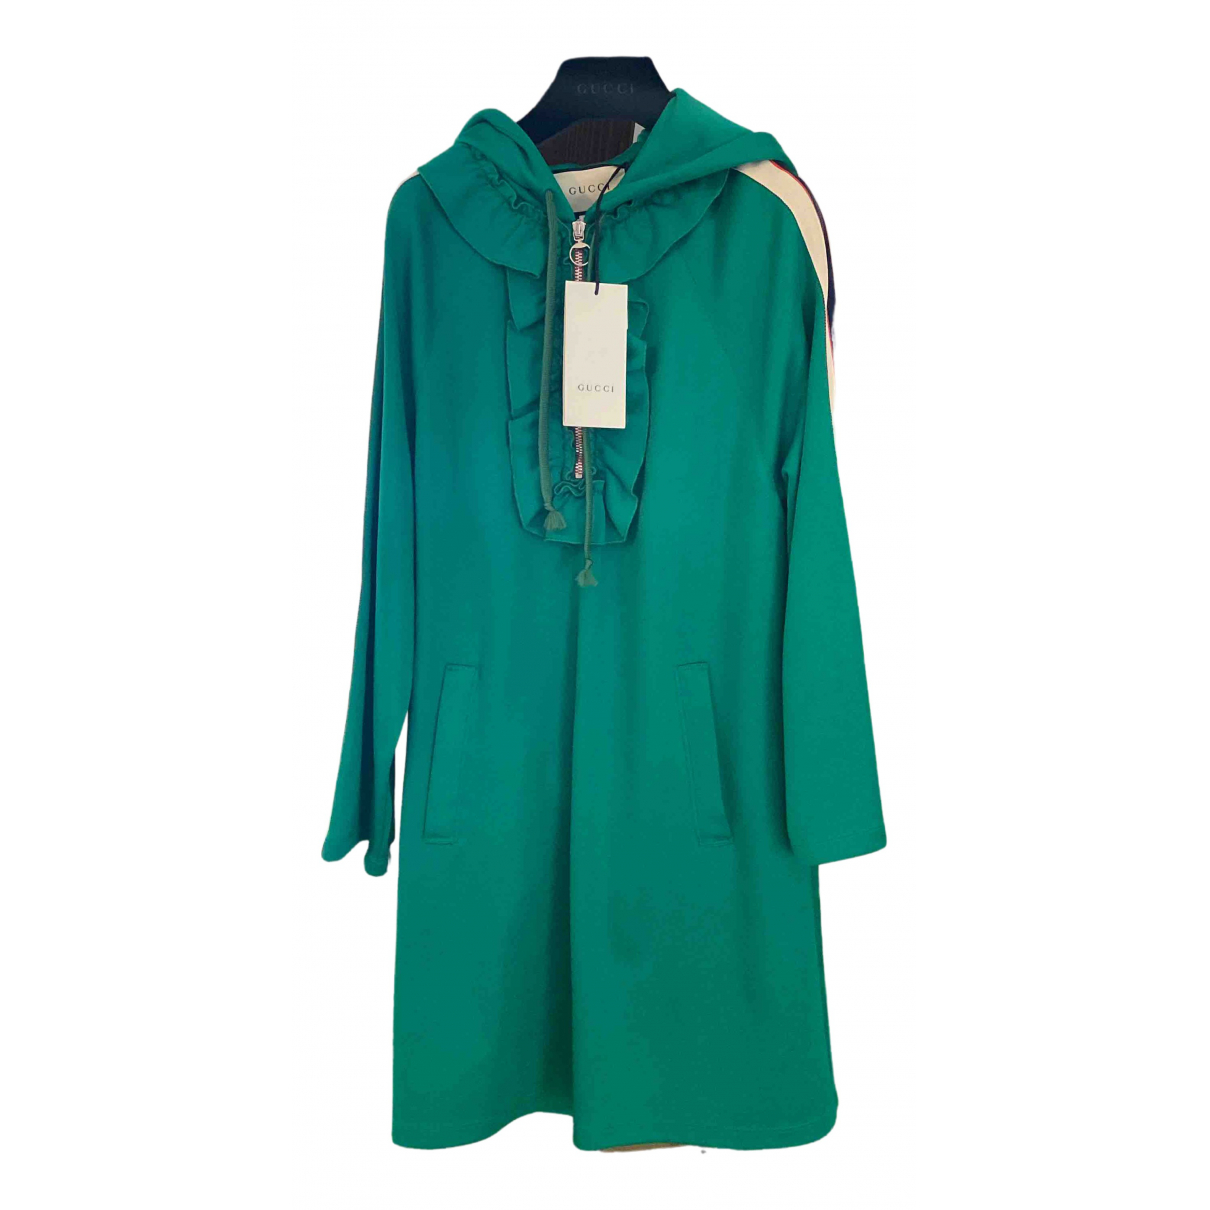 Gucci \N Kleid in  Gruen Baumwolle